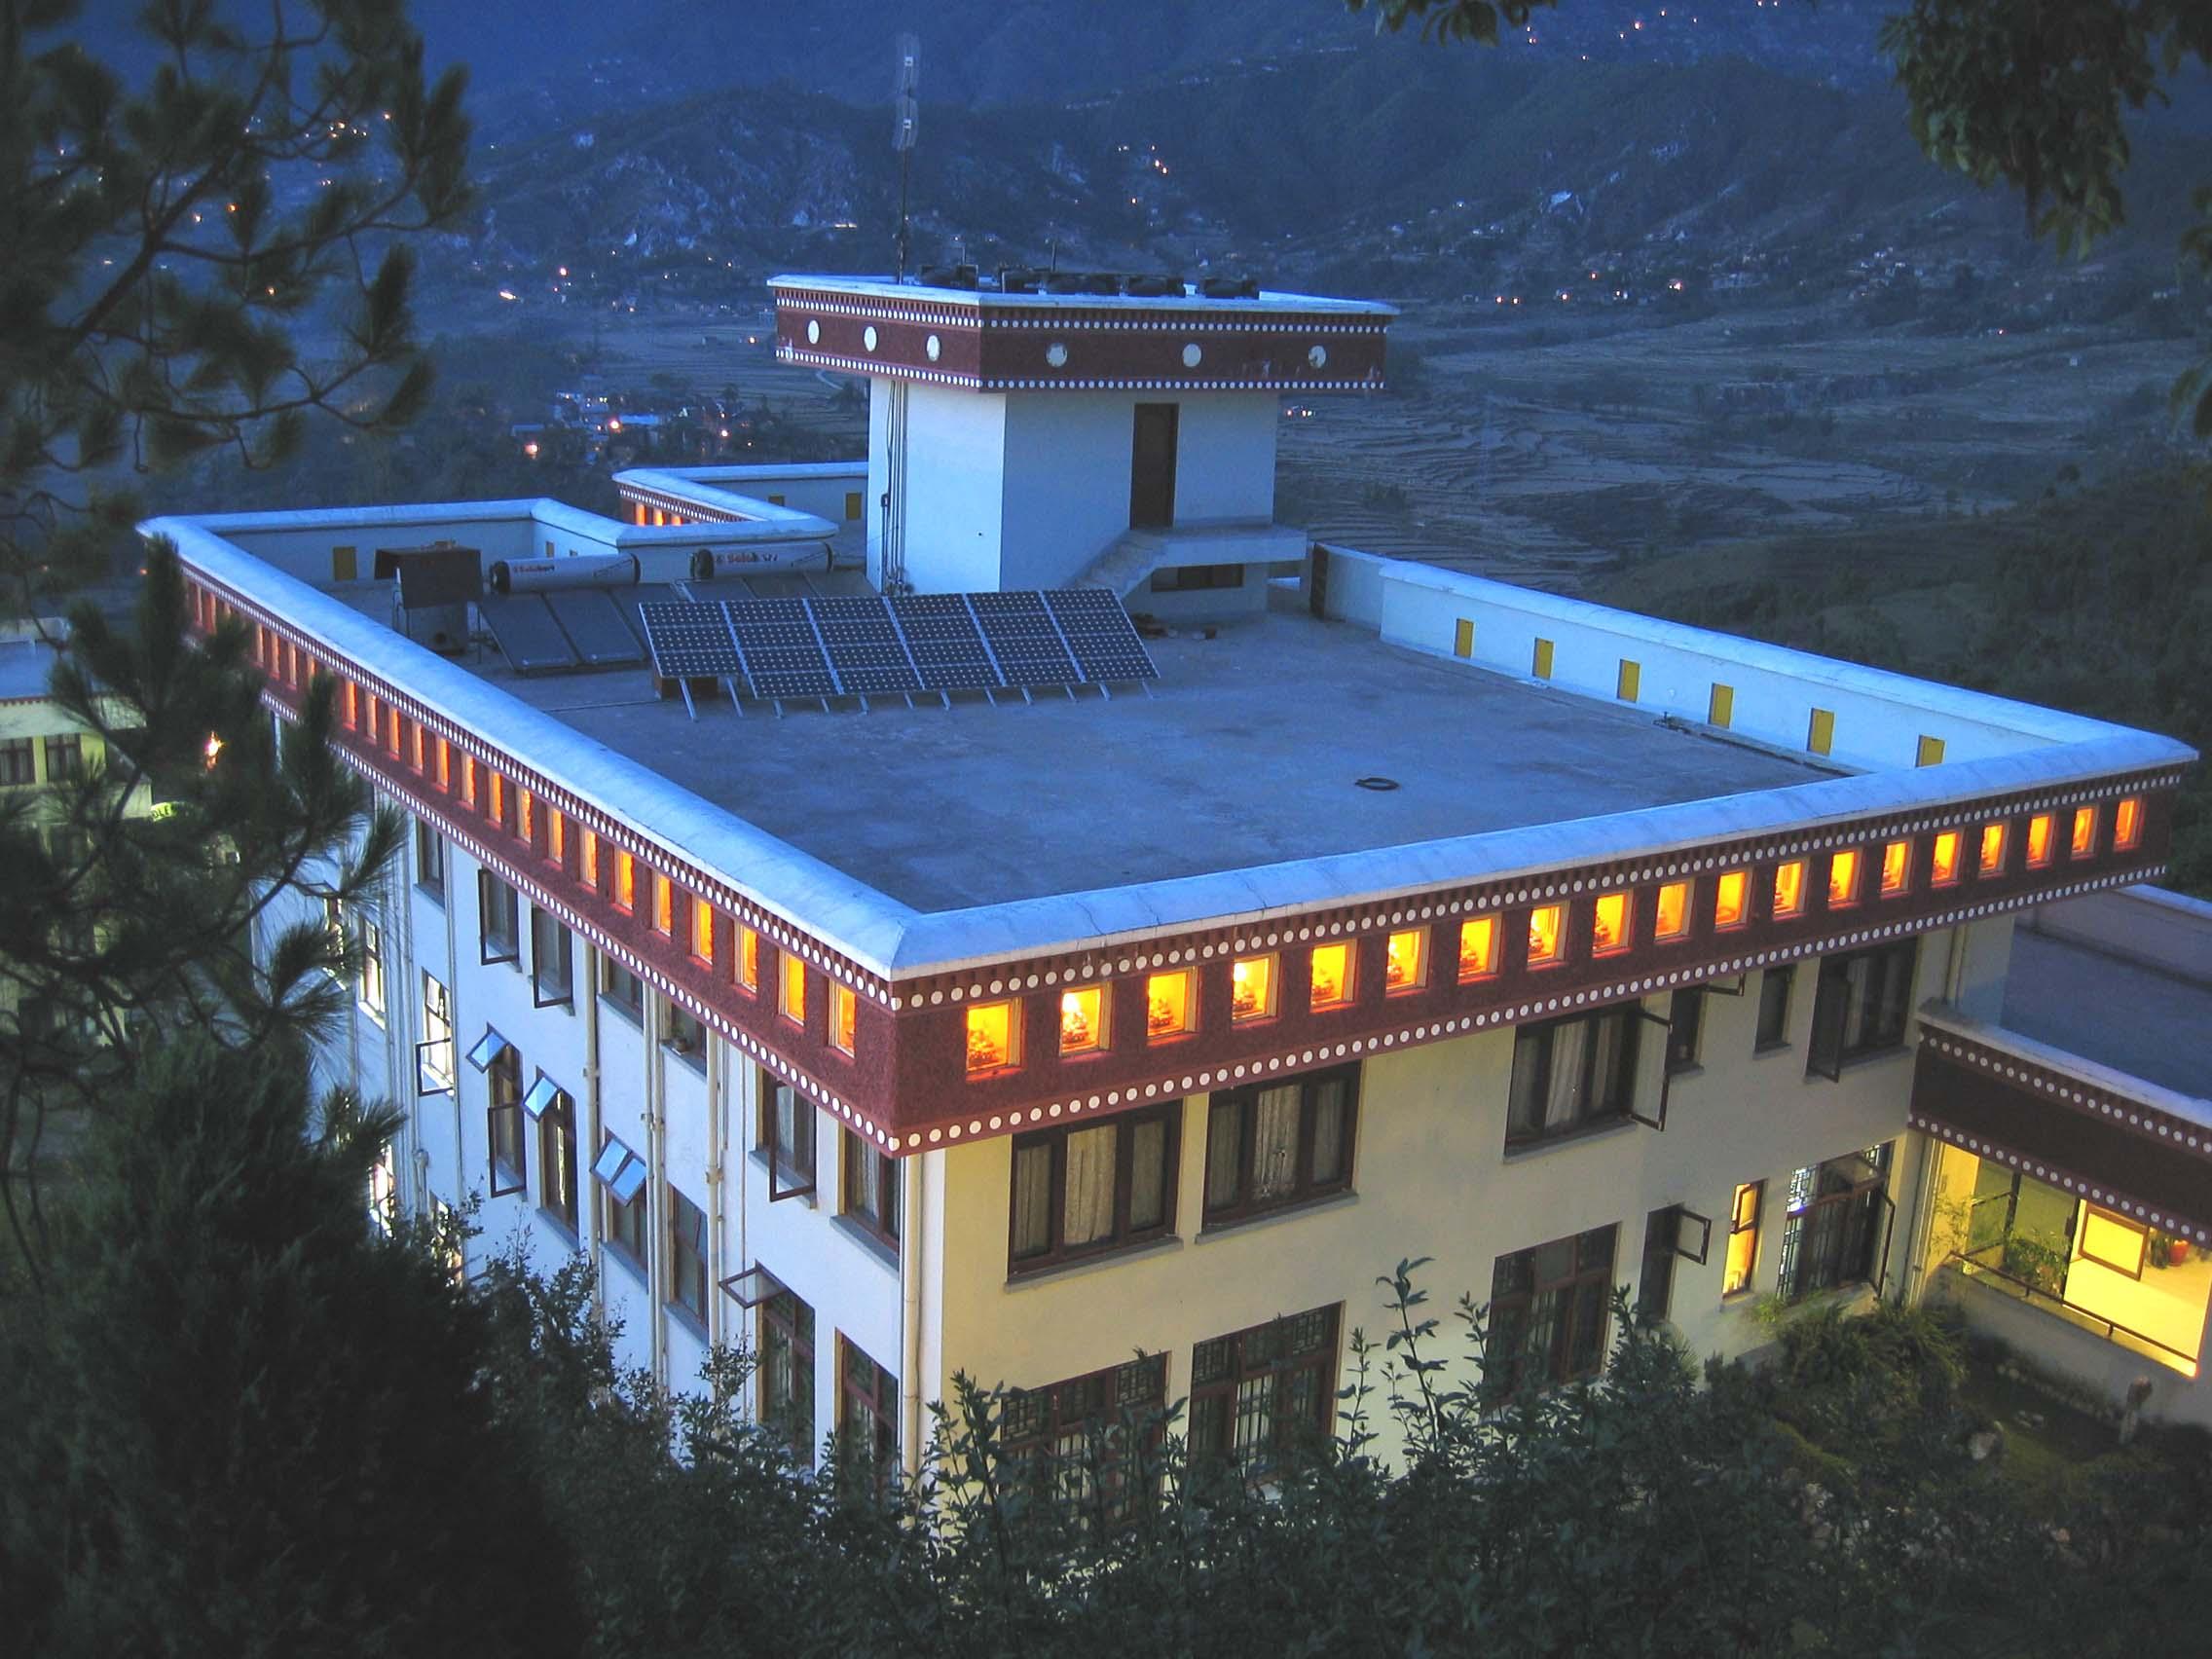 21 Taras illuminated at night with solar powered lights